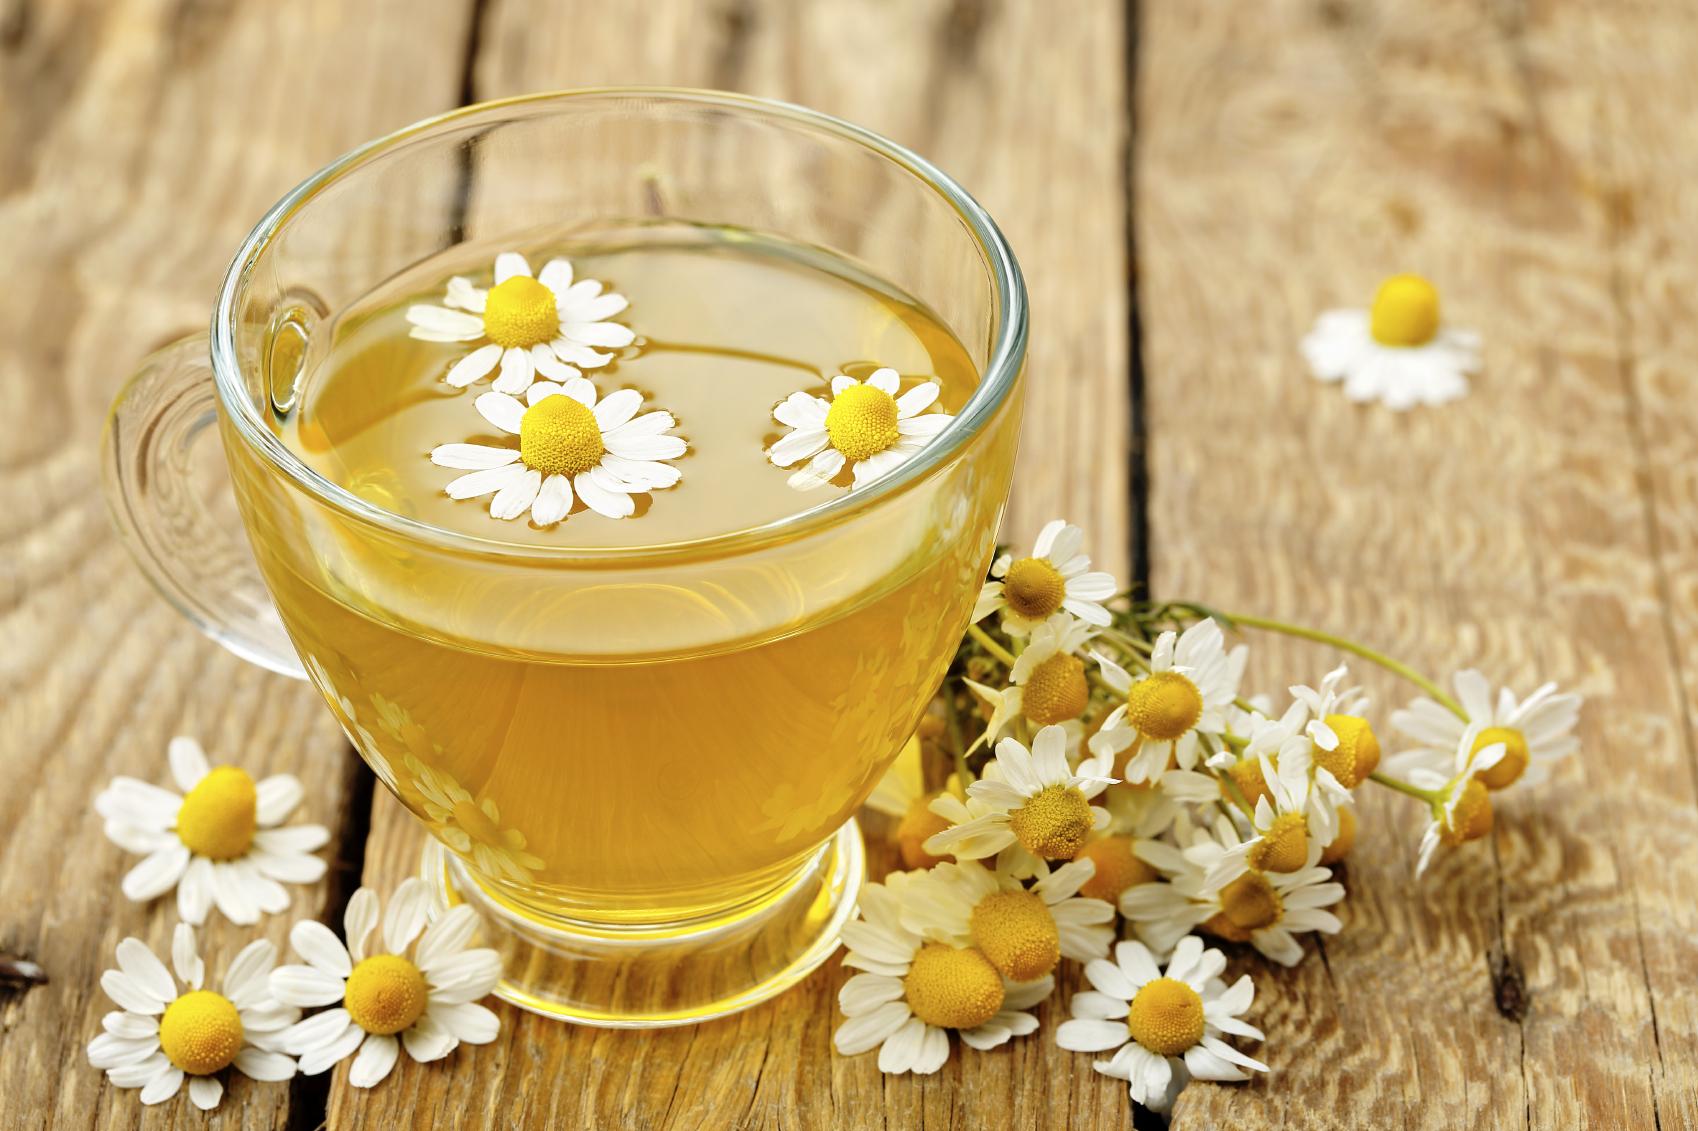 Chamomile tea kills cancer cells